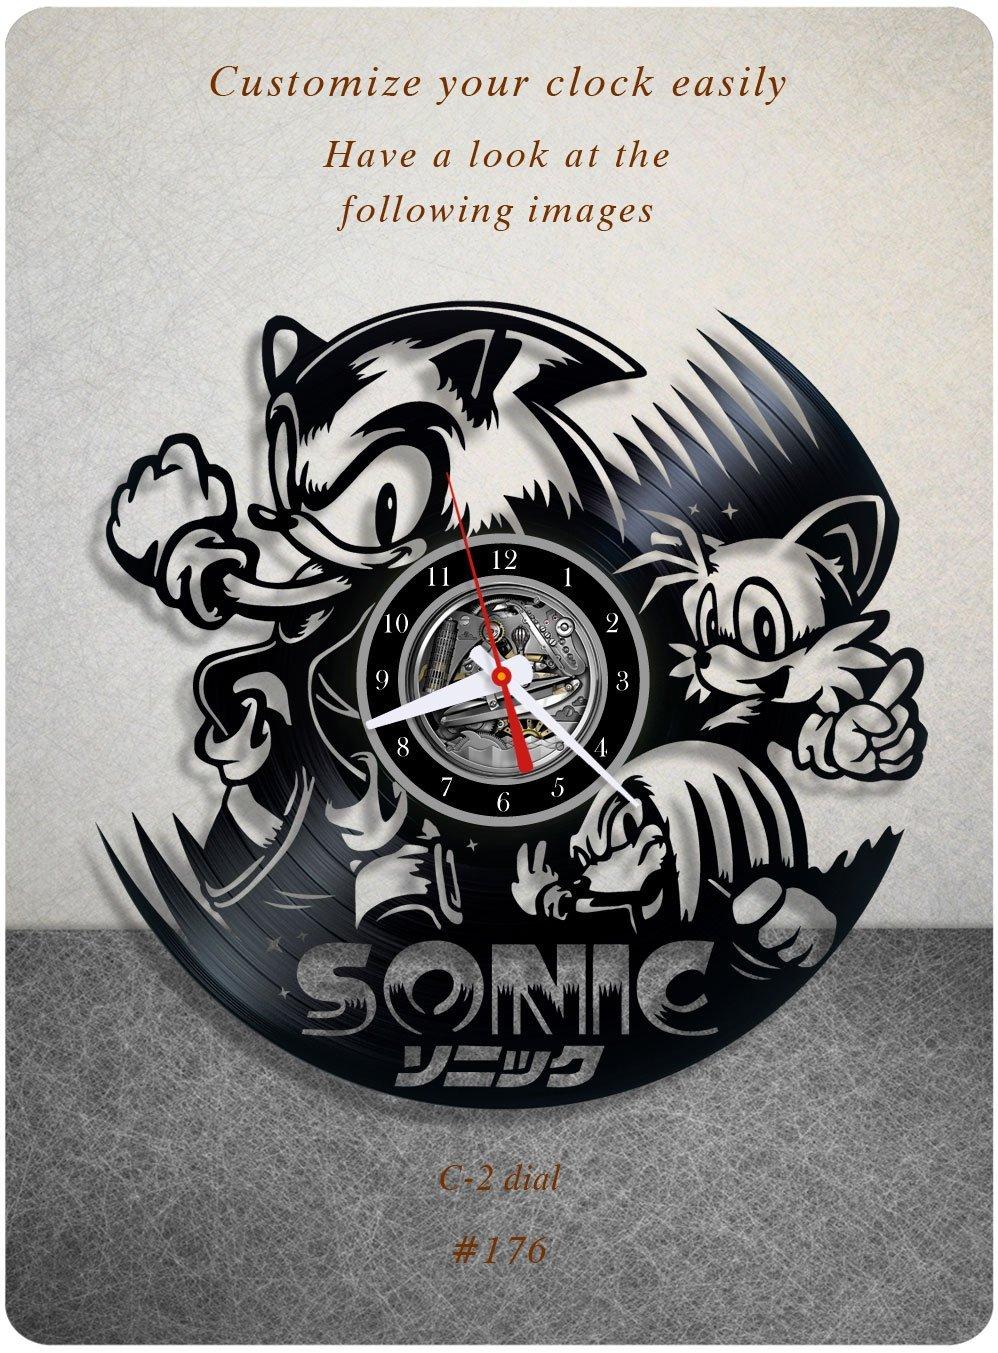 Buy Junsi Sonic The Hedgehog Full Body Shell Vinyl Decal Skin Sticker For Nintendo New 3ds In Cheap Price On M Alibaba Com